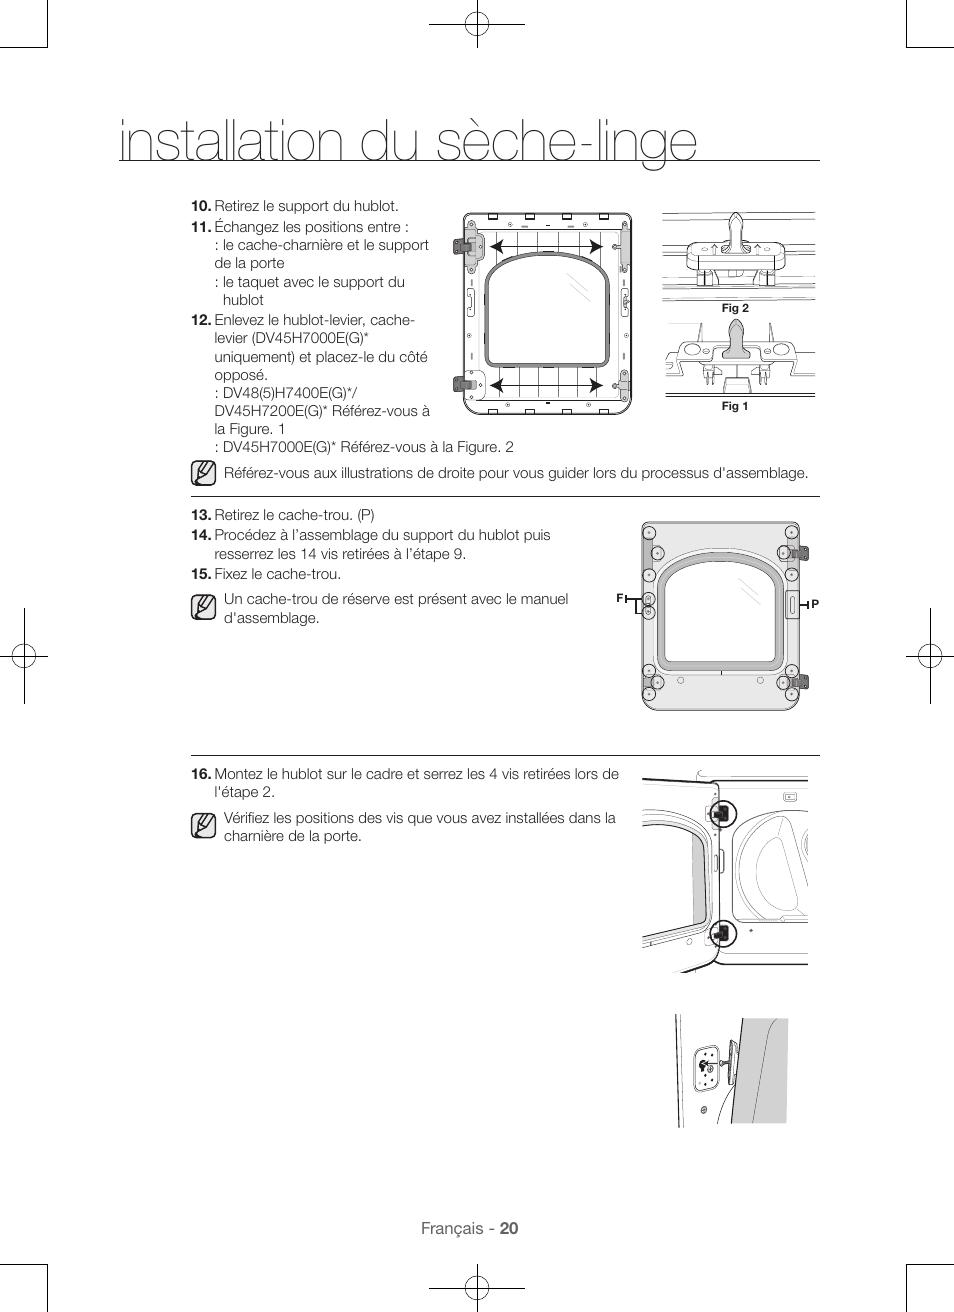 Installation du sèche-linge   Samsung DV48H7400GW-A2 User Manual   Page 60 /